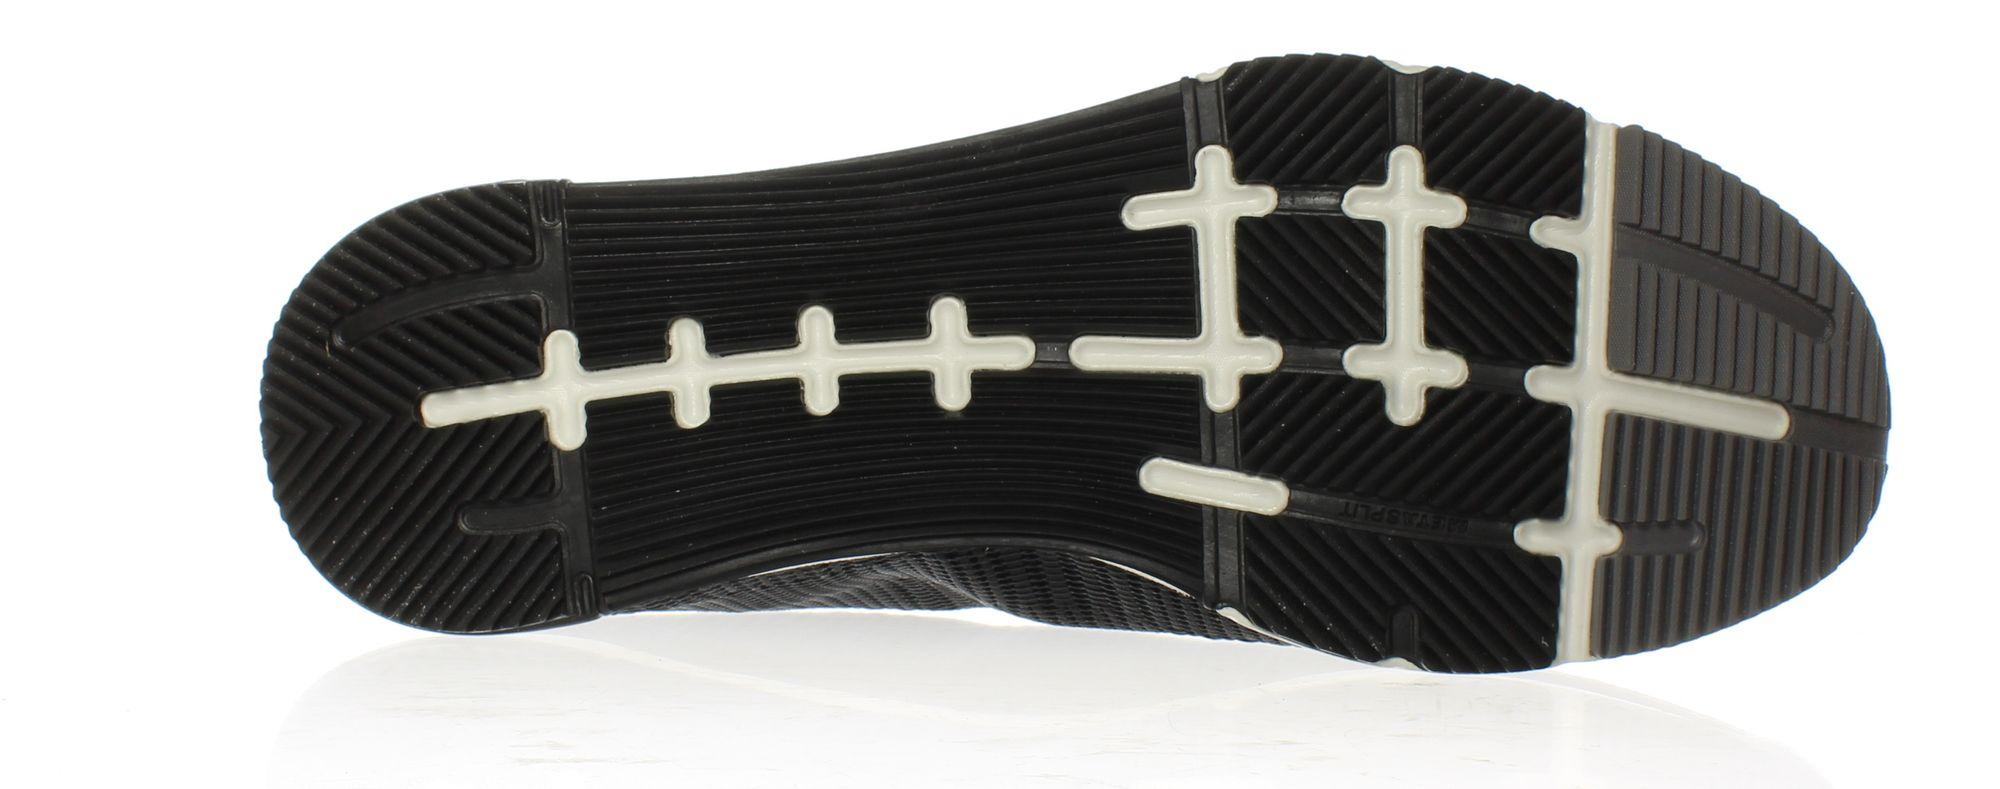 Reebok-Mens-Athletic-Speed-TR-Flexweave-Cross-Training-Shoes thumbnail 9